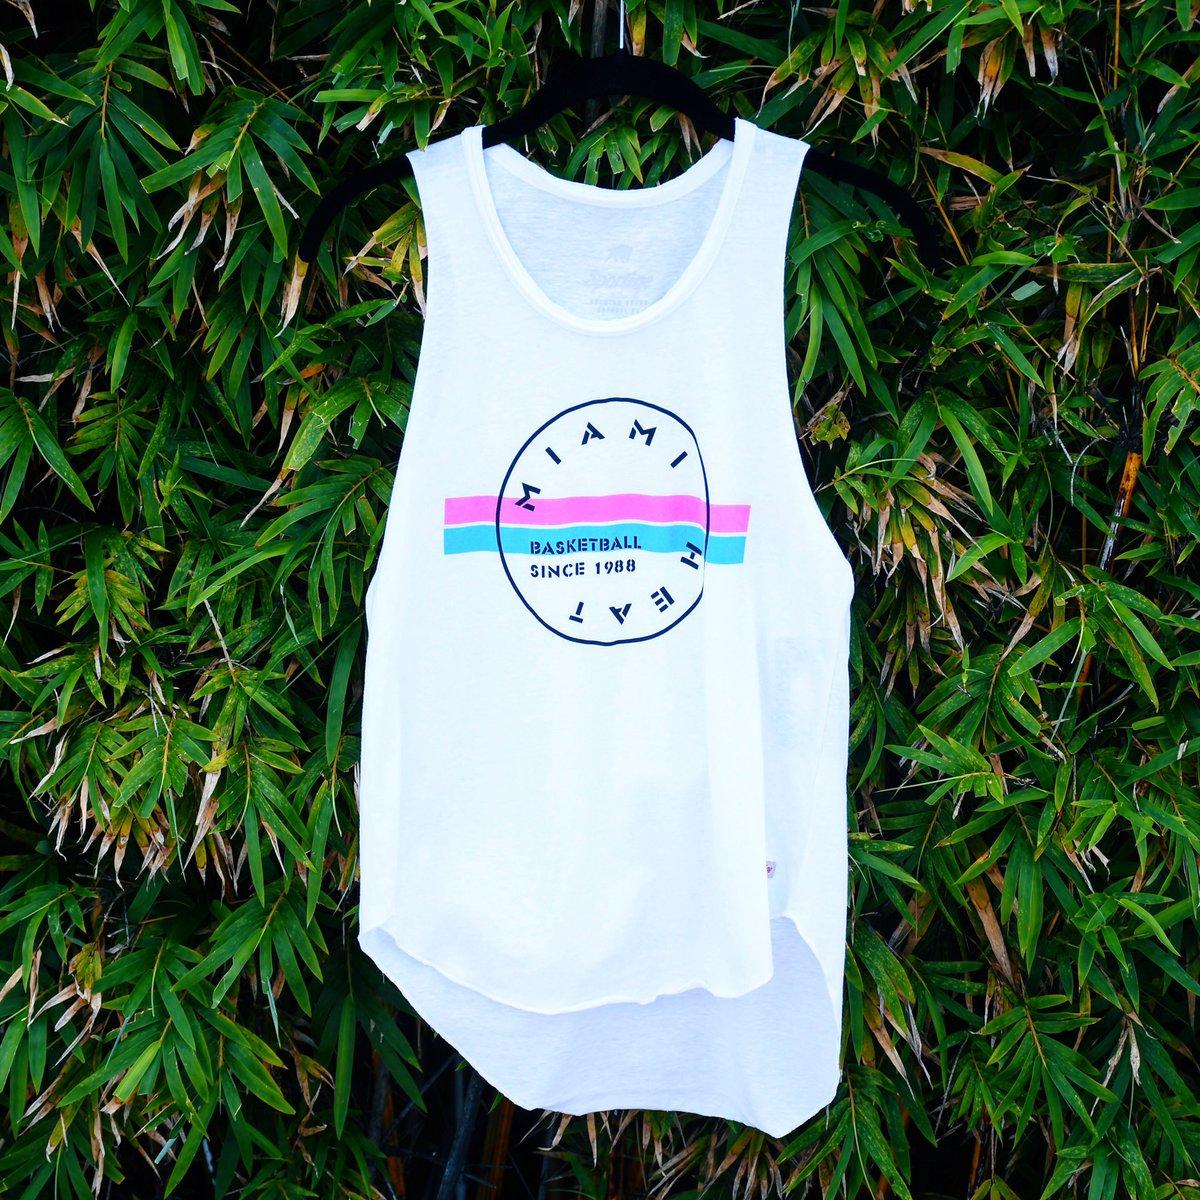 size 40 a7b65 b2fdf The Miami HEAT Store (@MiamiHEATstore) | Twitter